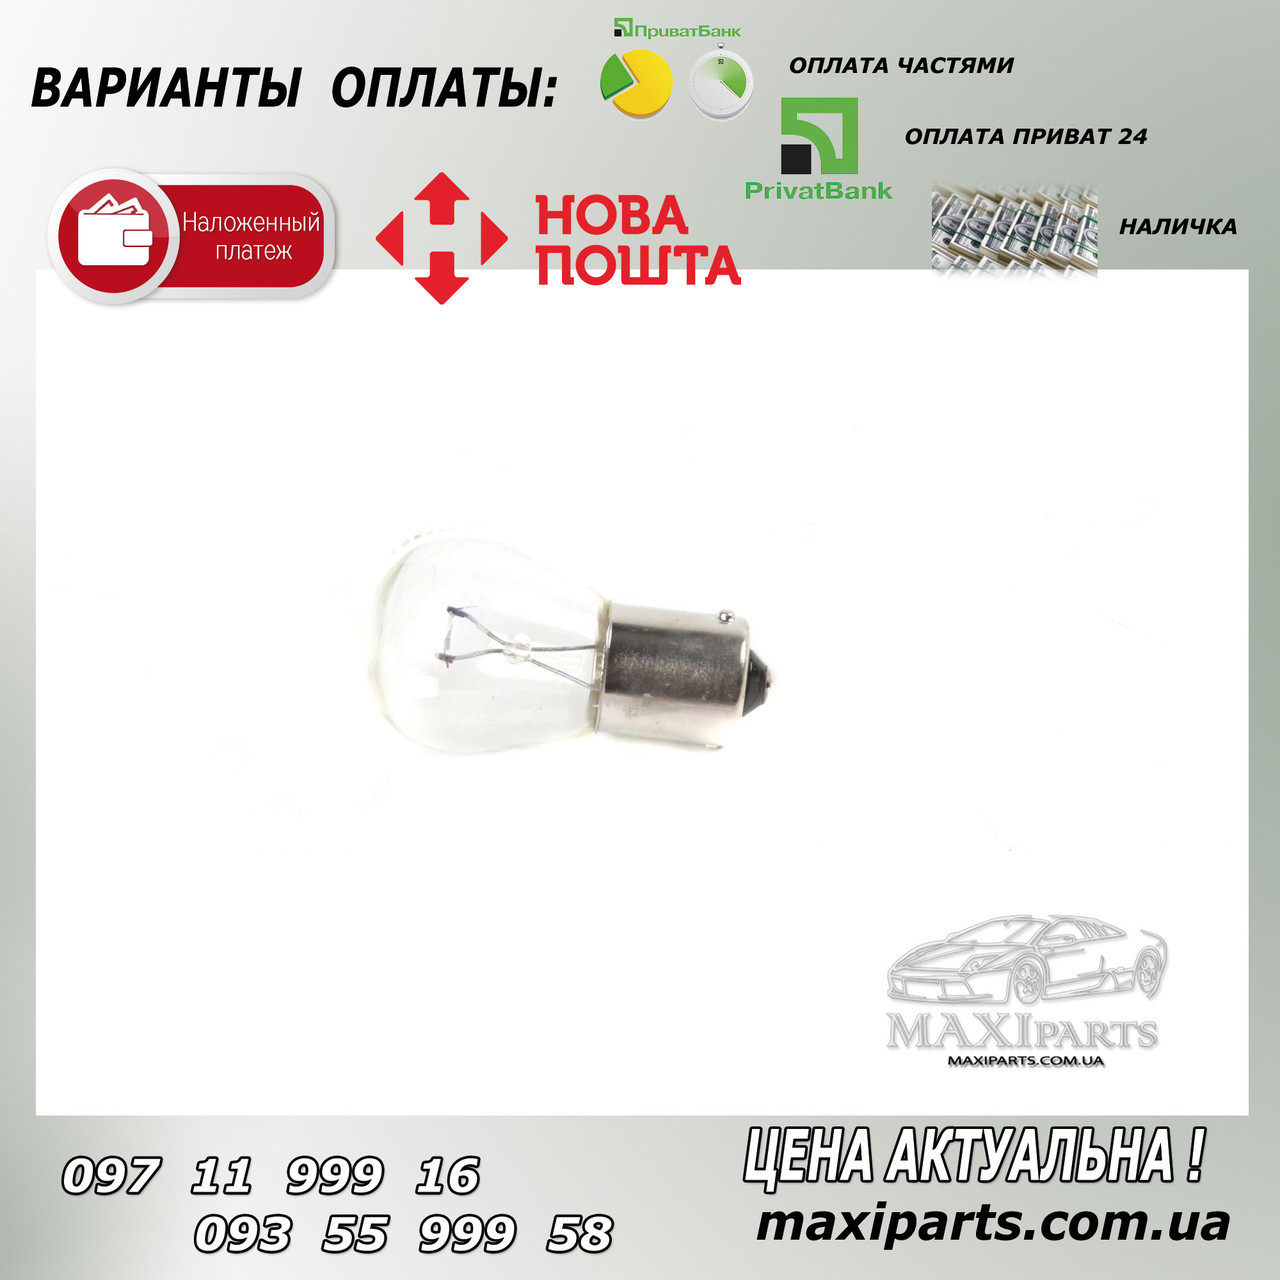 Автолампа P21W 24V 21W BA15s SCC Brake/Indicator